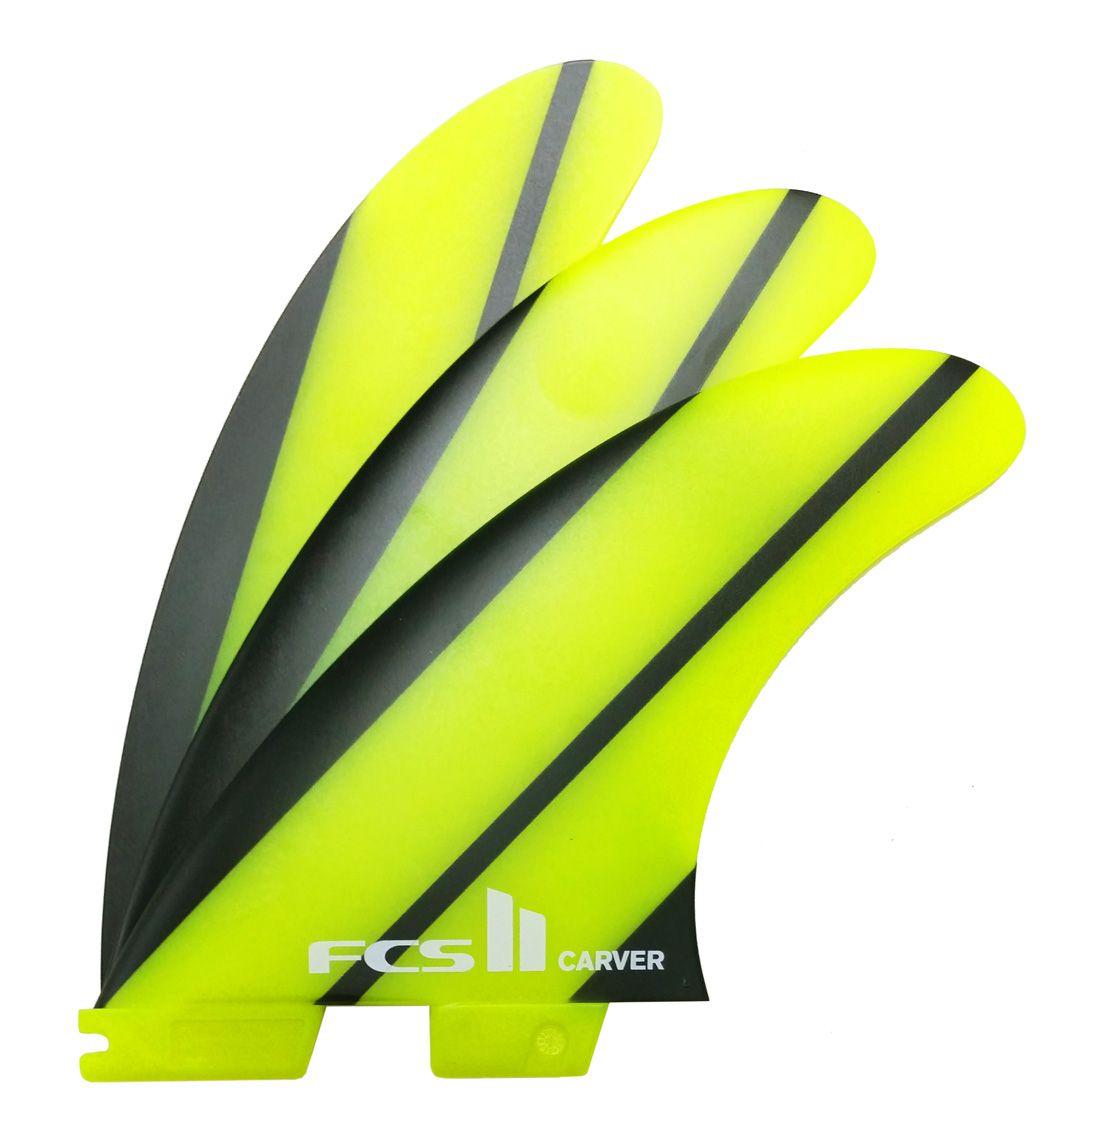 Quilha FCS II Carver Neo Glass - Medium